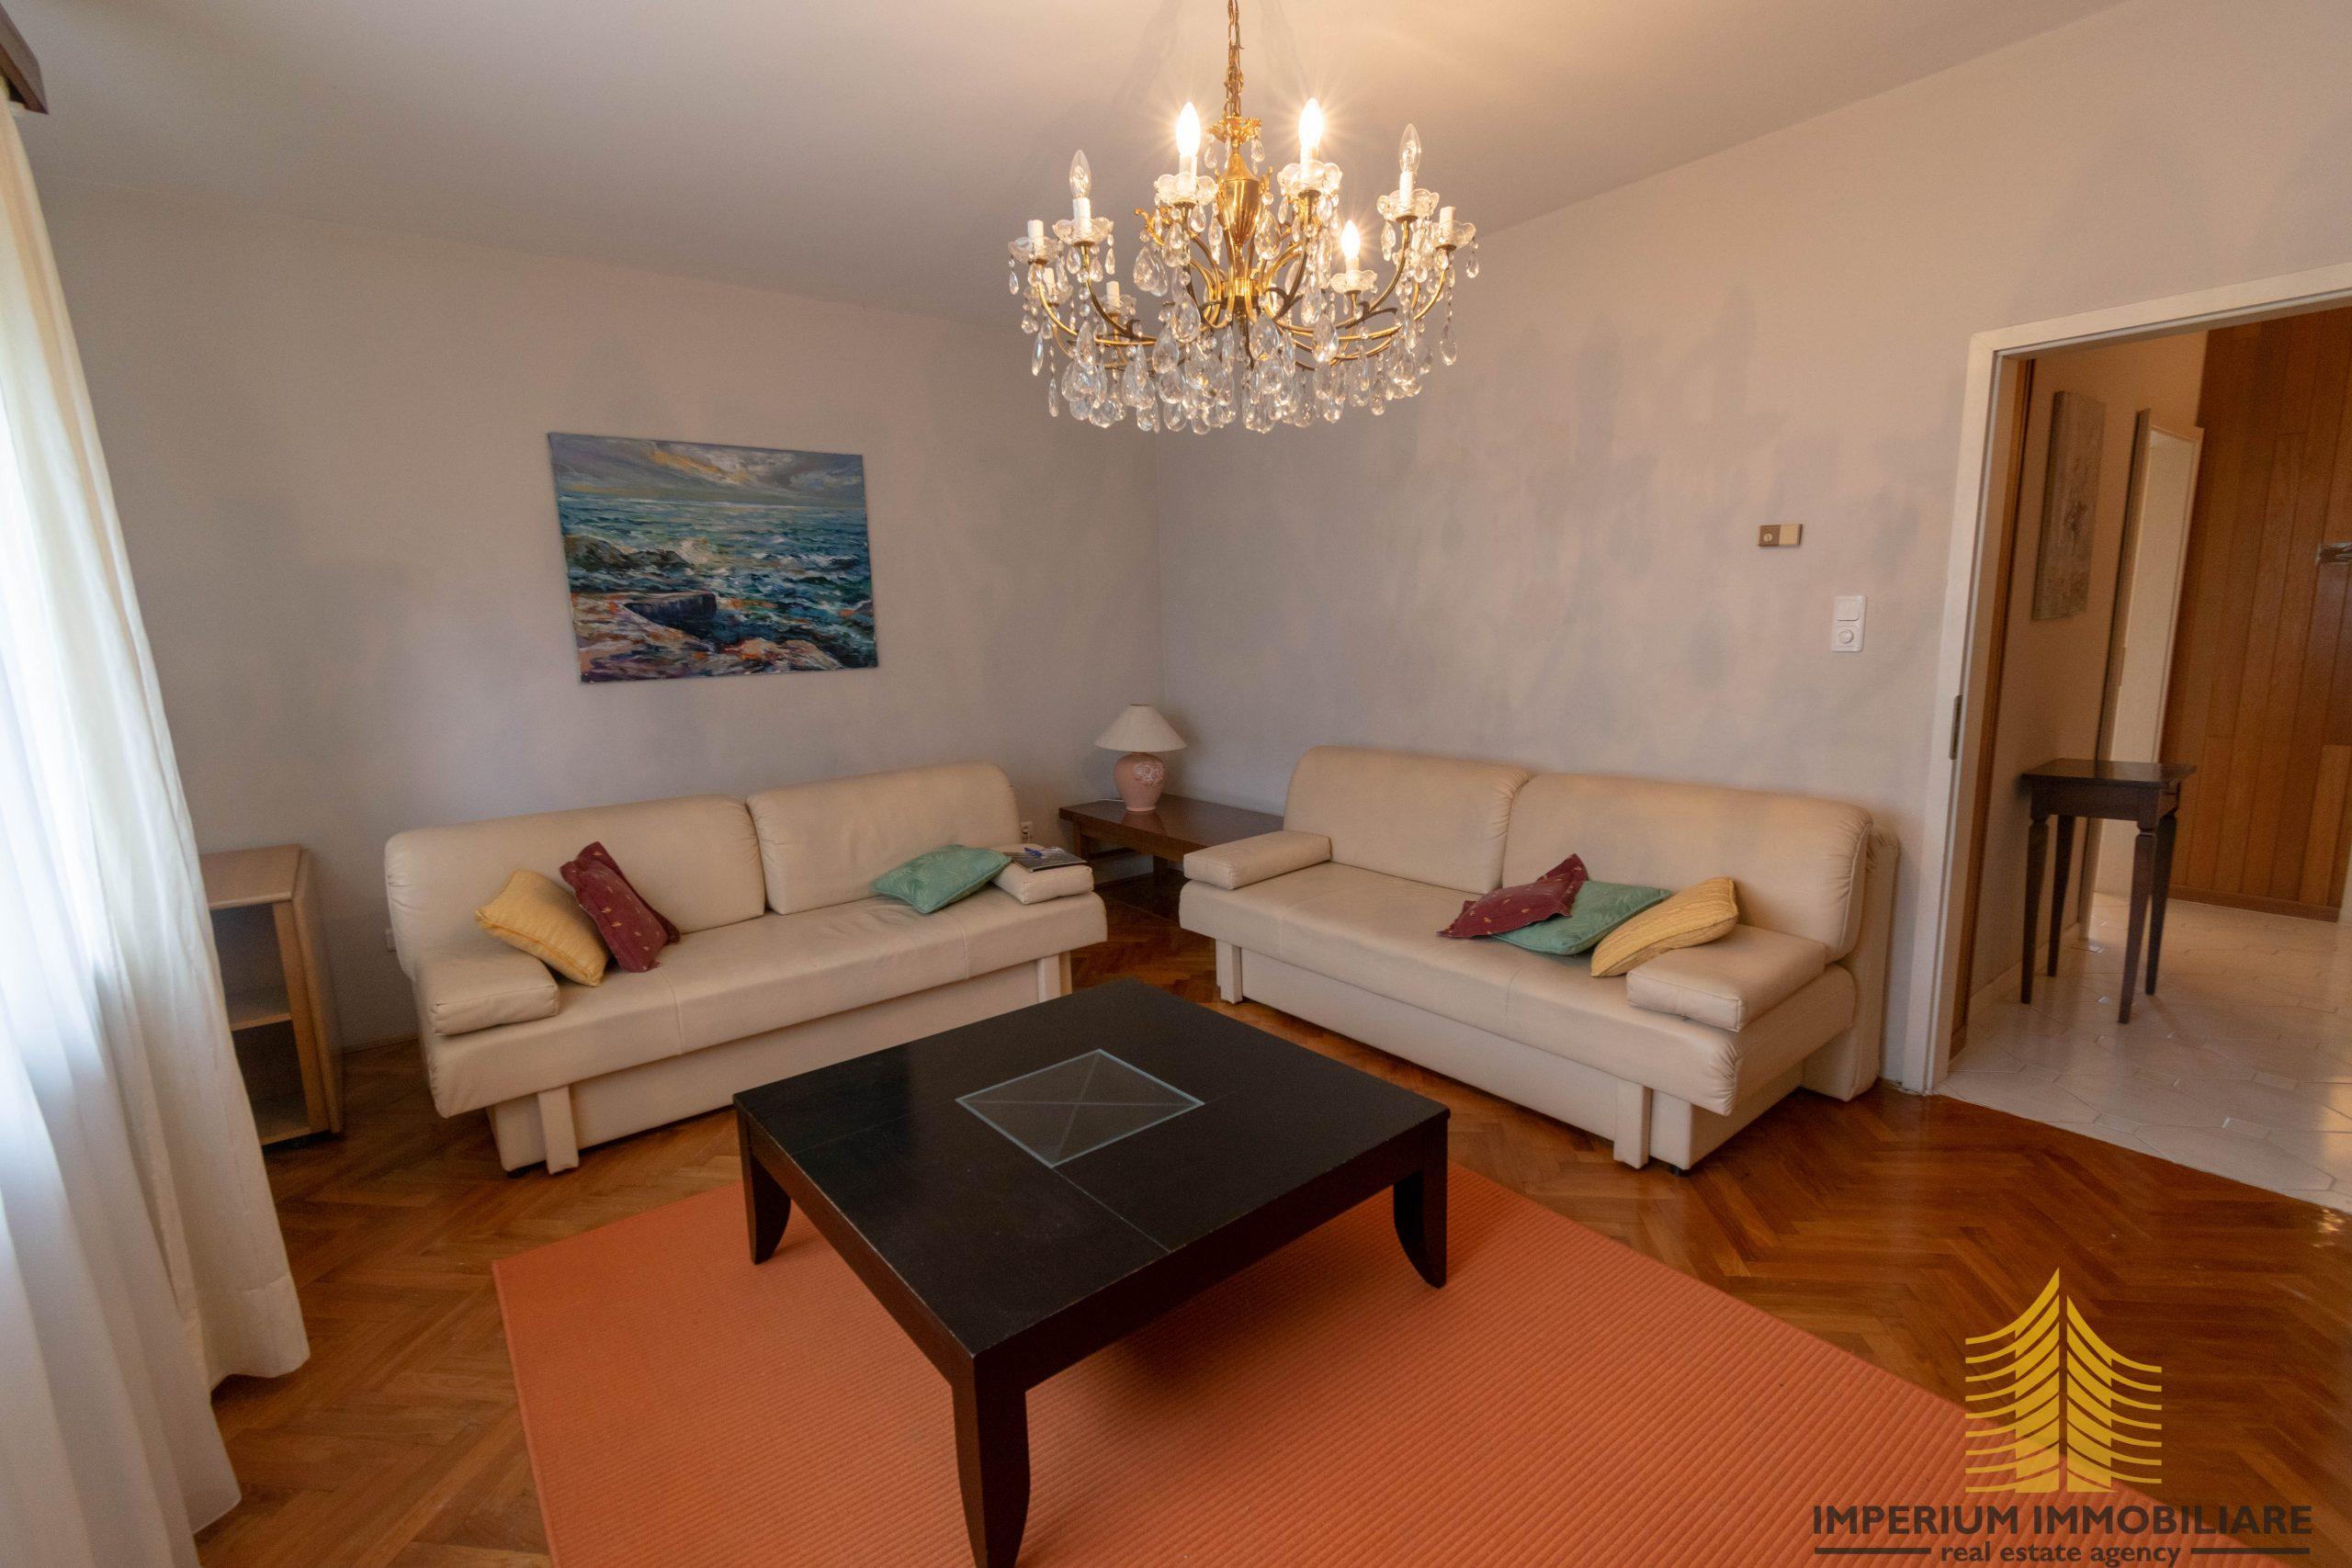 Stan: Zagreb (Svetice), 96.00 m2, 2ss+db, terasa, garaža, bukovačka (iznajmljivanje)